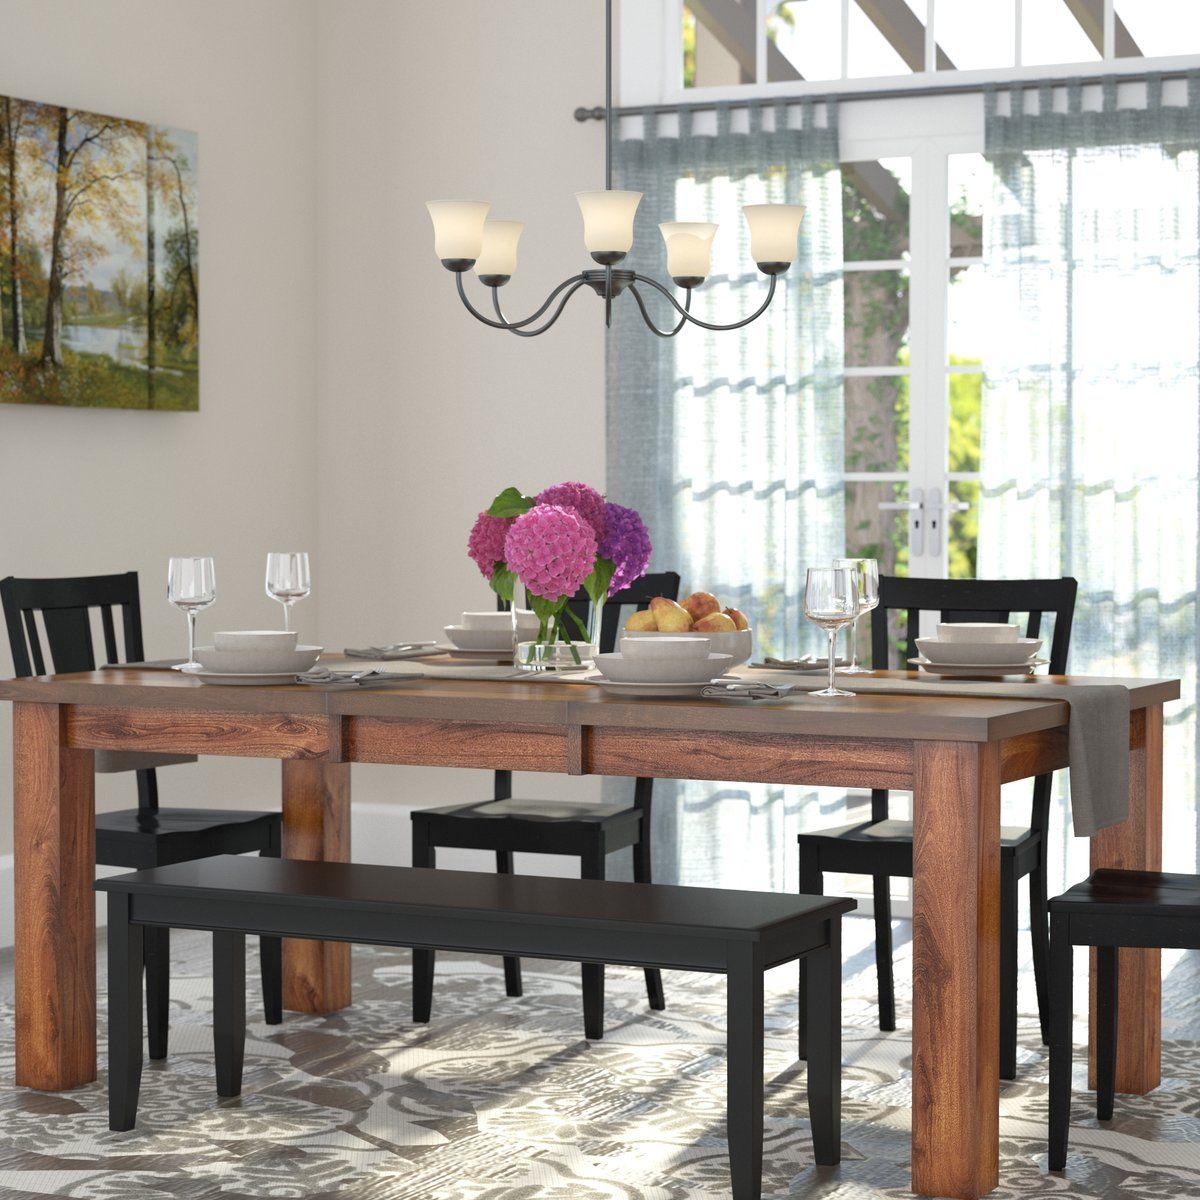 Benchwright Extending Dining Table, Blackened Oak | Decor Throughout Latest Blackened Oak Benchwright Extending Dining Tables (View 6 of 25)